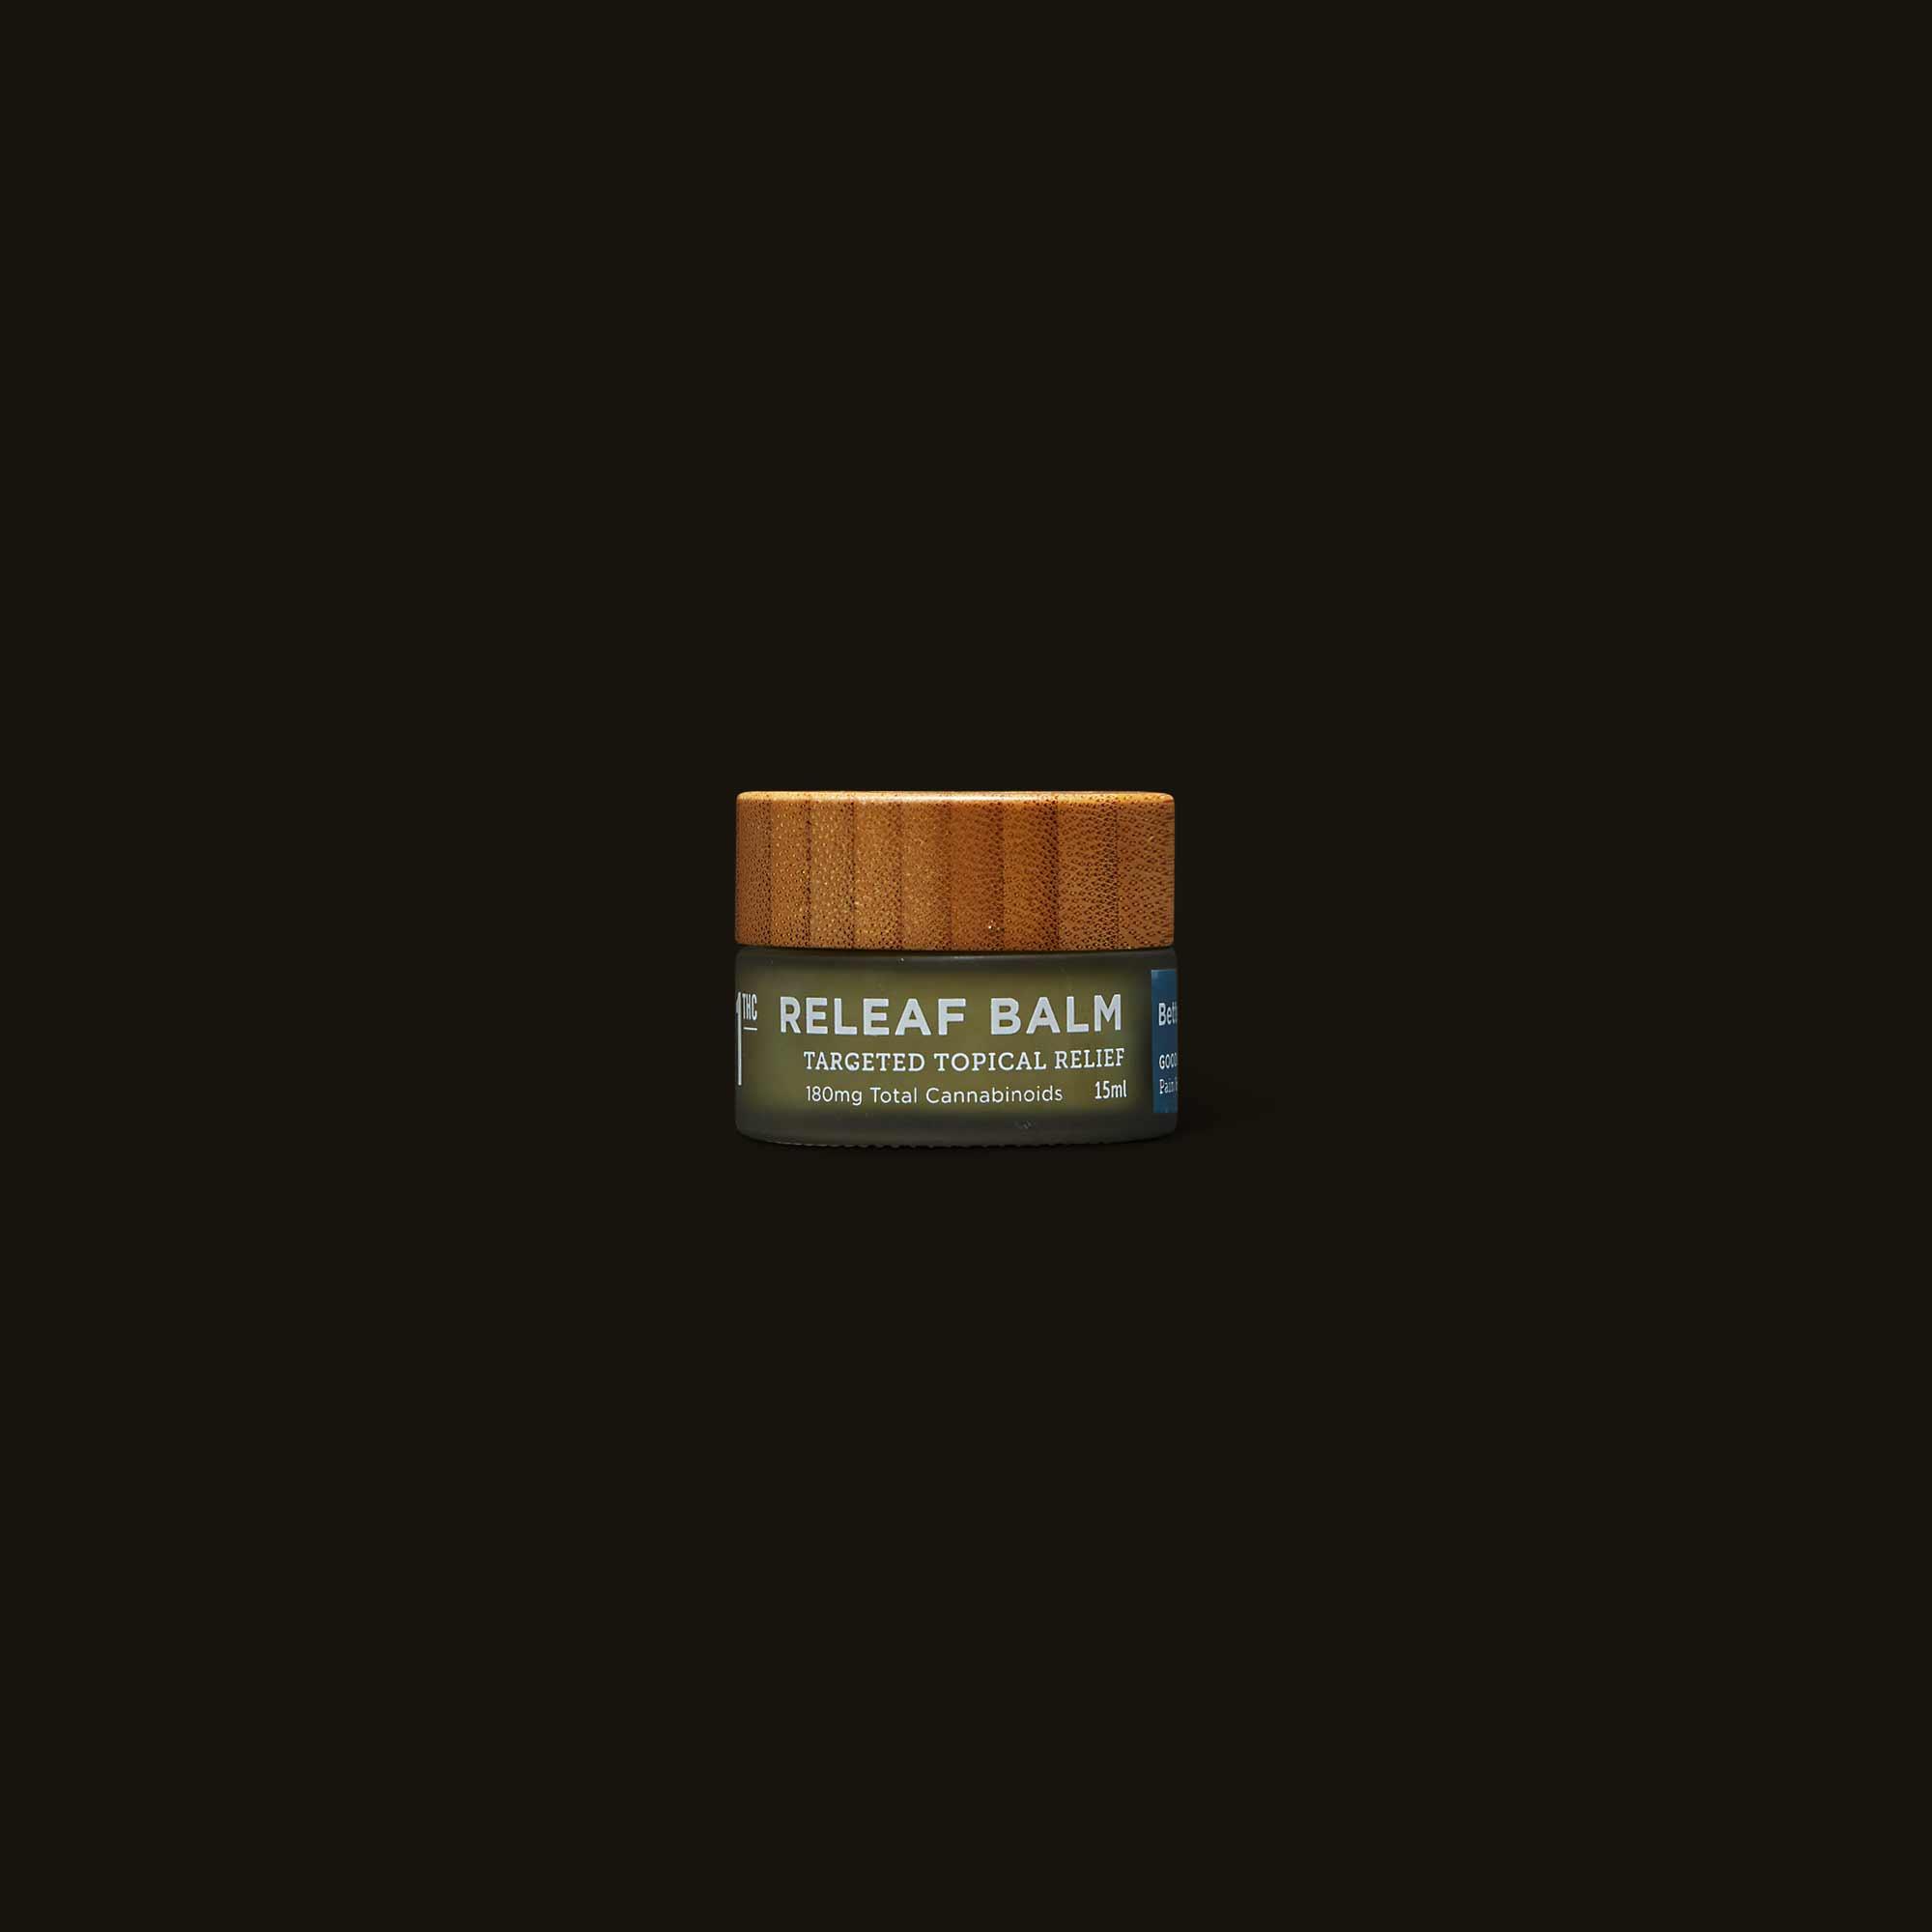 Papa & Barkley 3:1 CBD:THC Releaf Balm